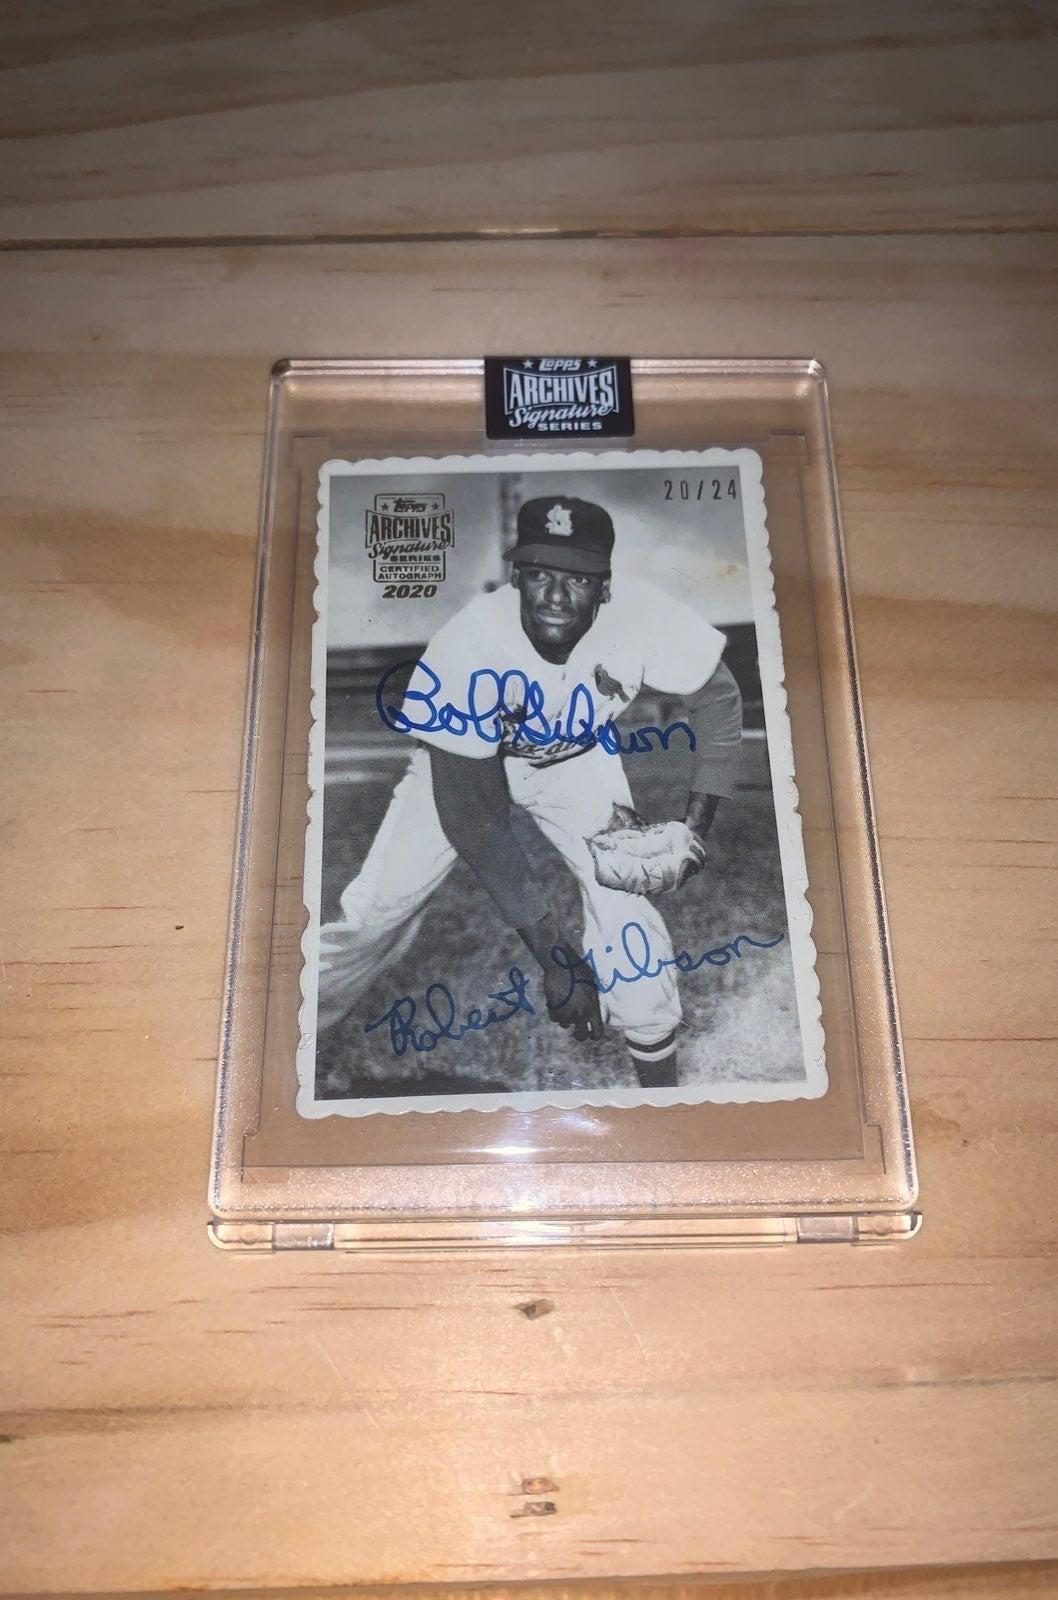 Bob Gibson Archives Signature 20/24